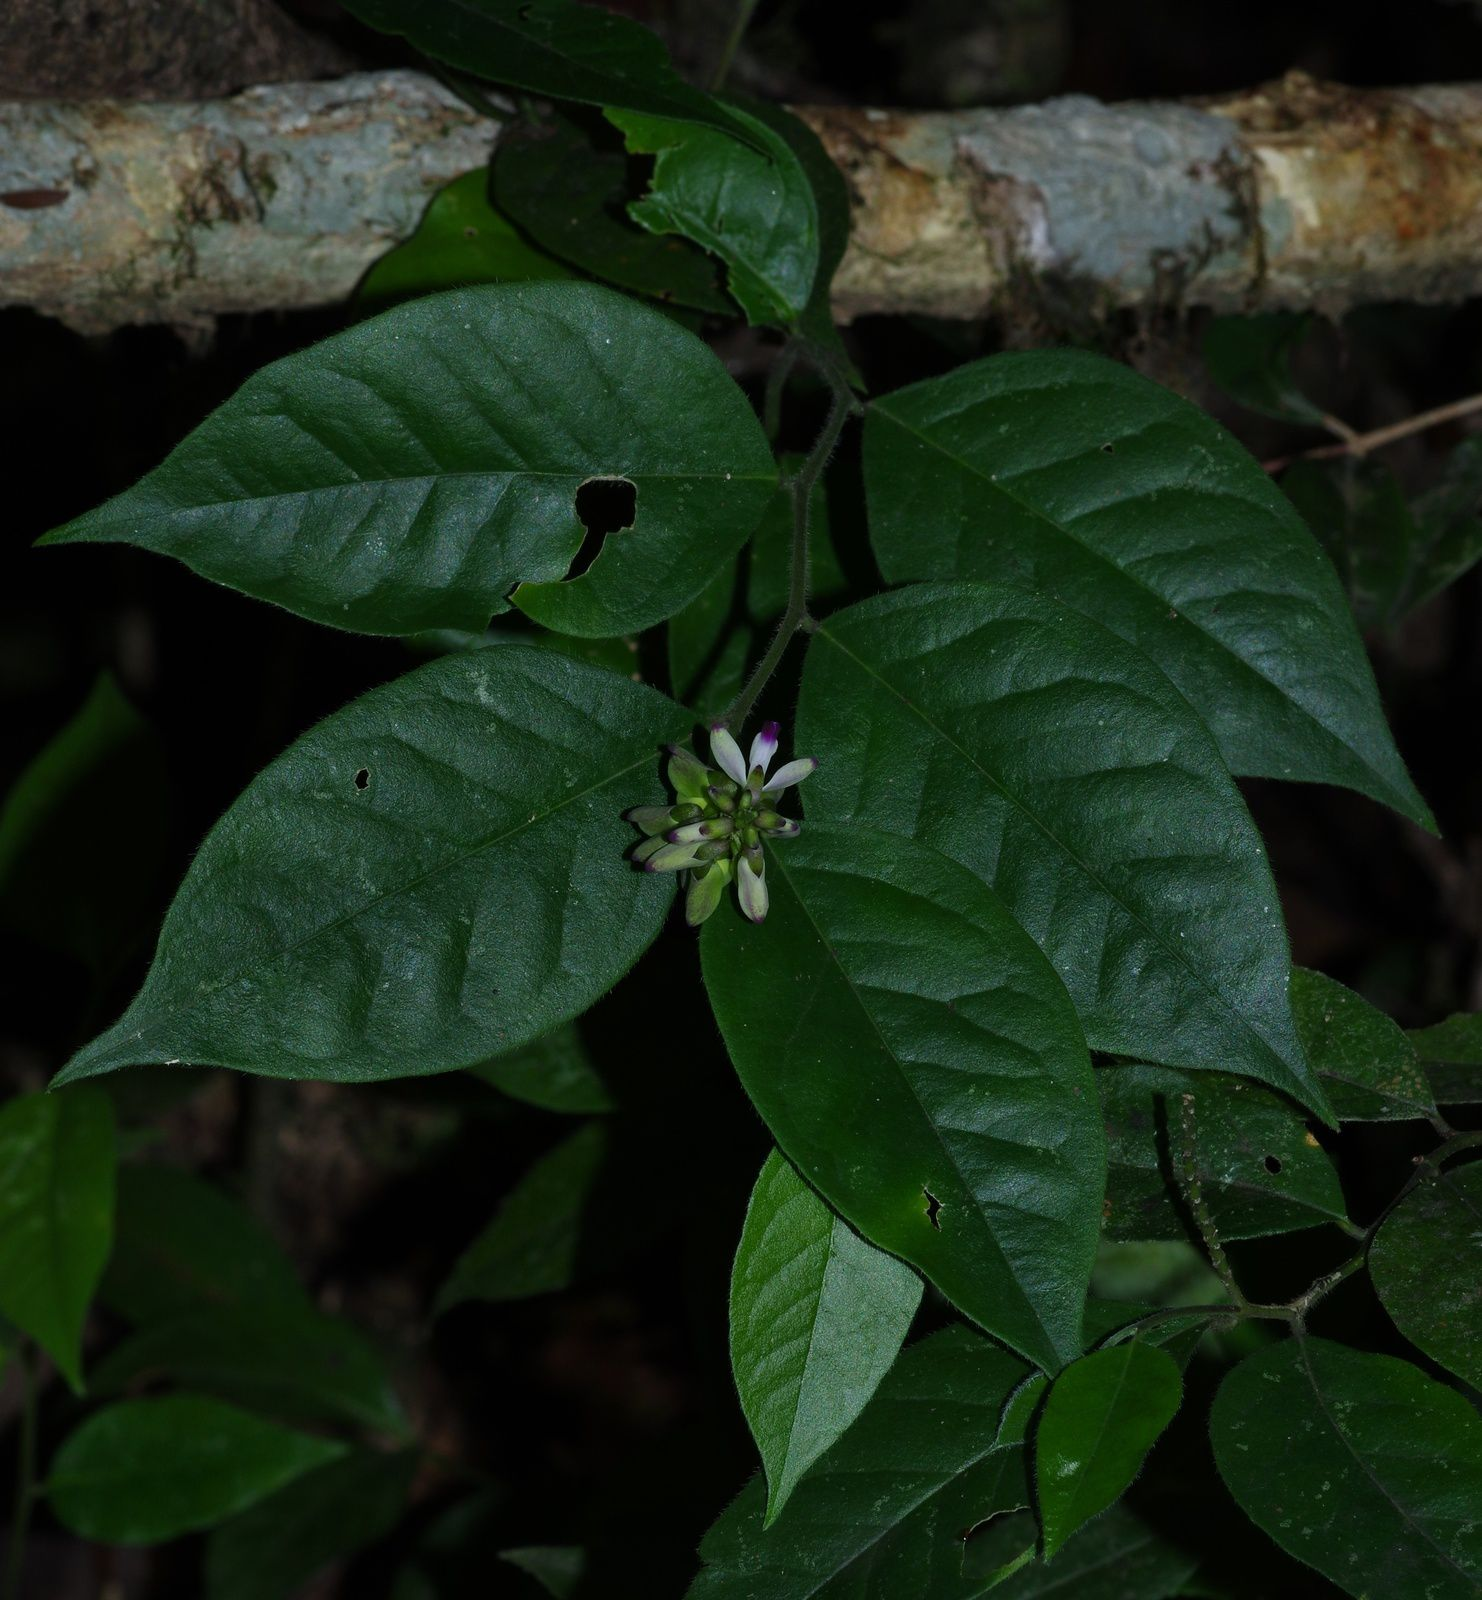 Asemeia echinosperma